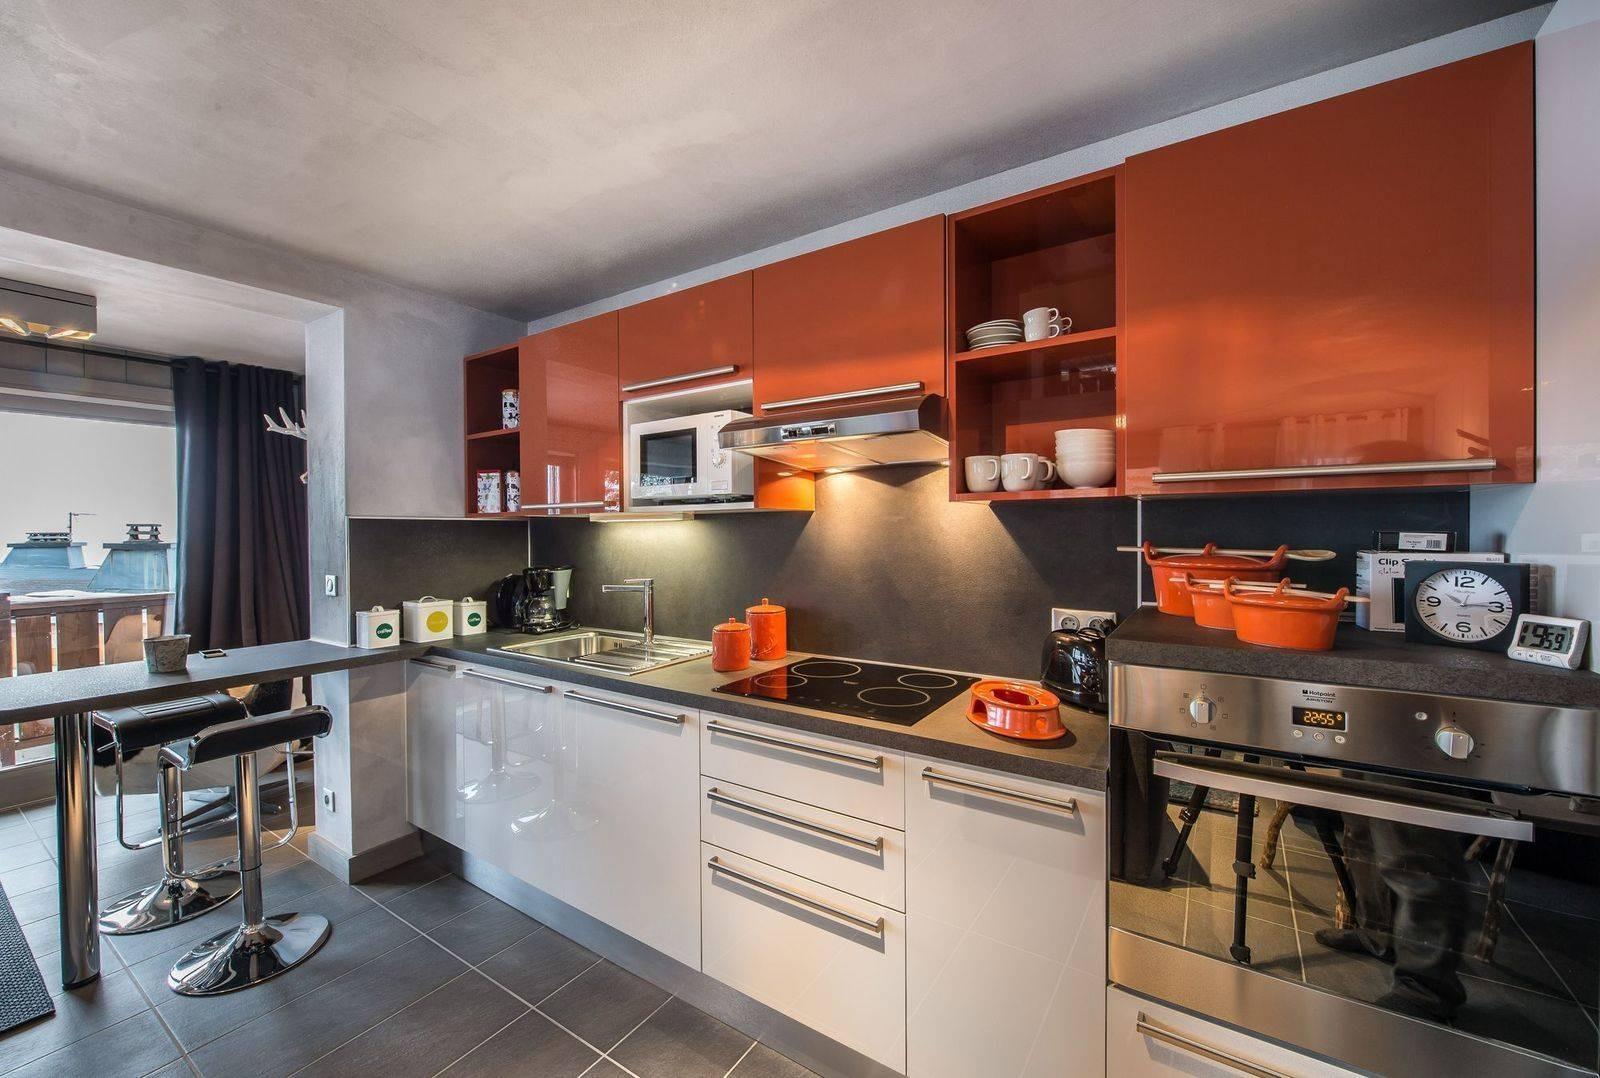 Courchevel 1650 Location Appartement Luxe Simeline Cuisine 2